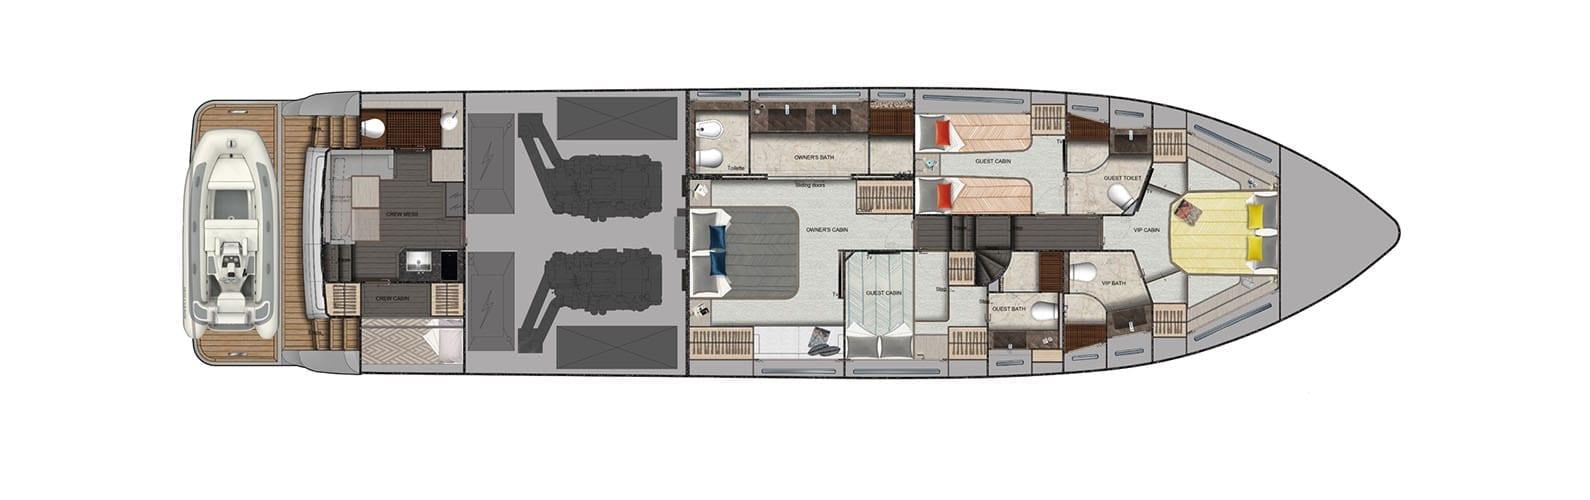 Uniesse-Capri-8-Footprint-4